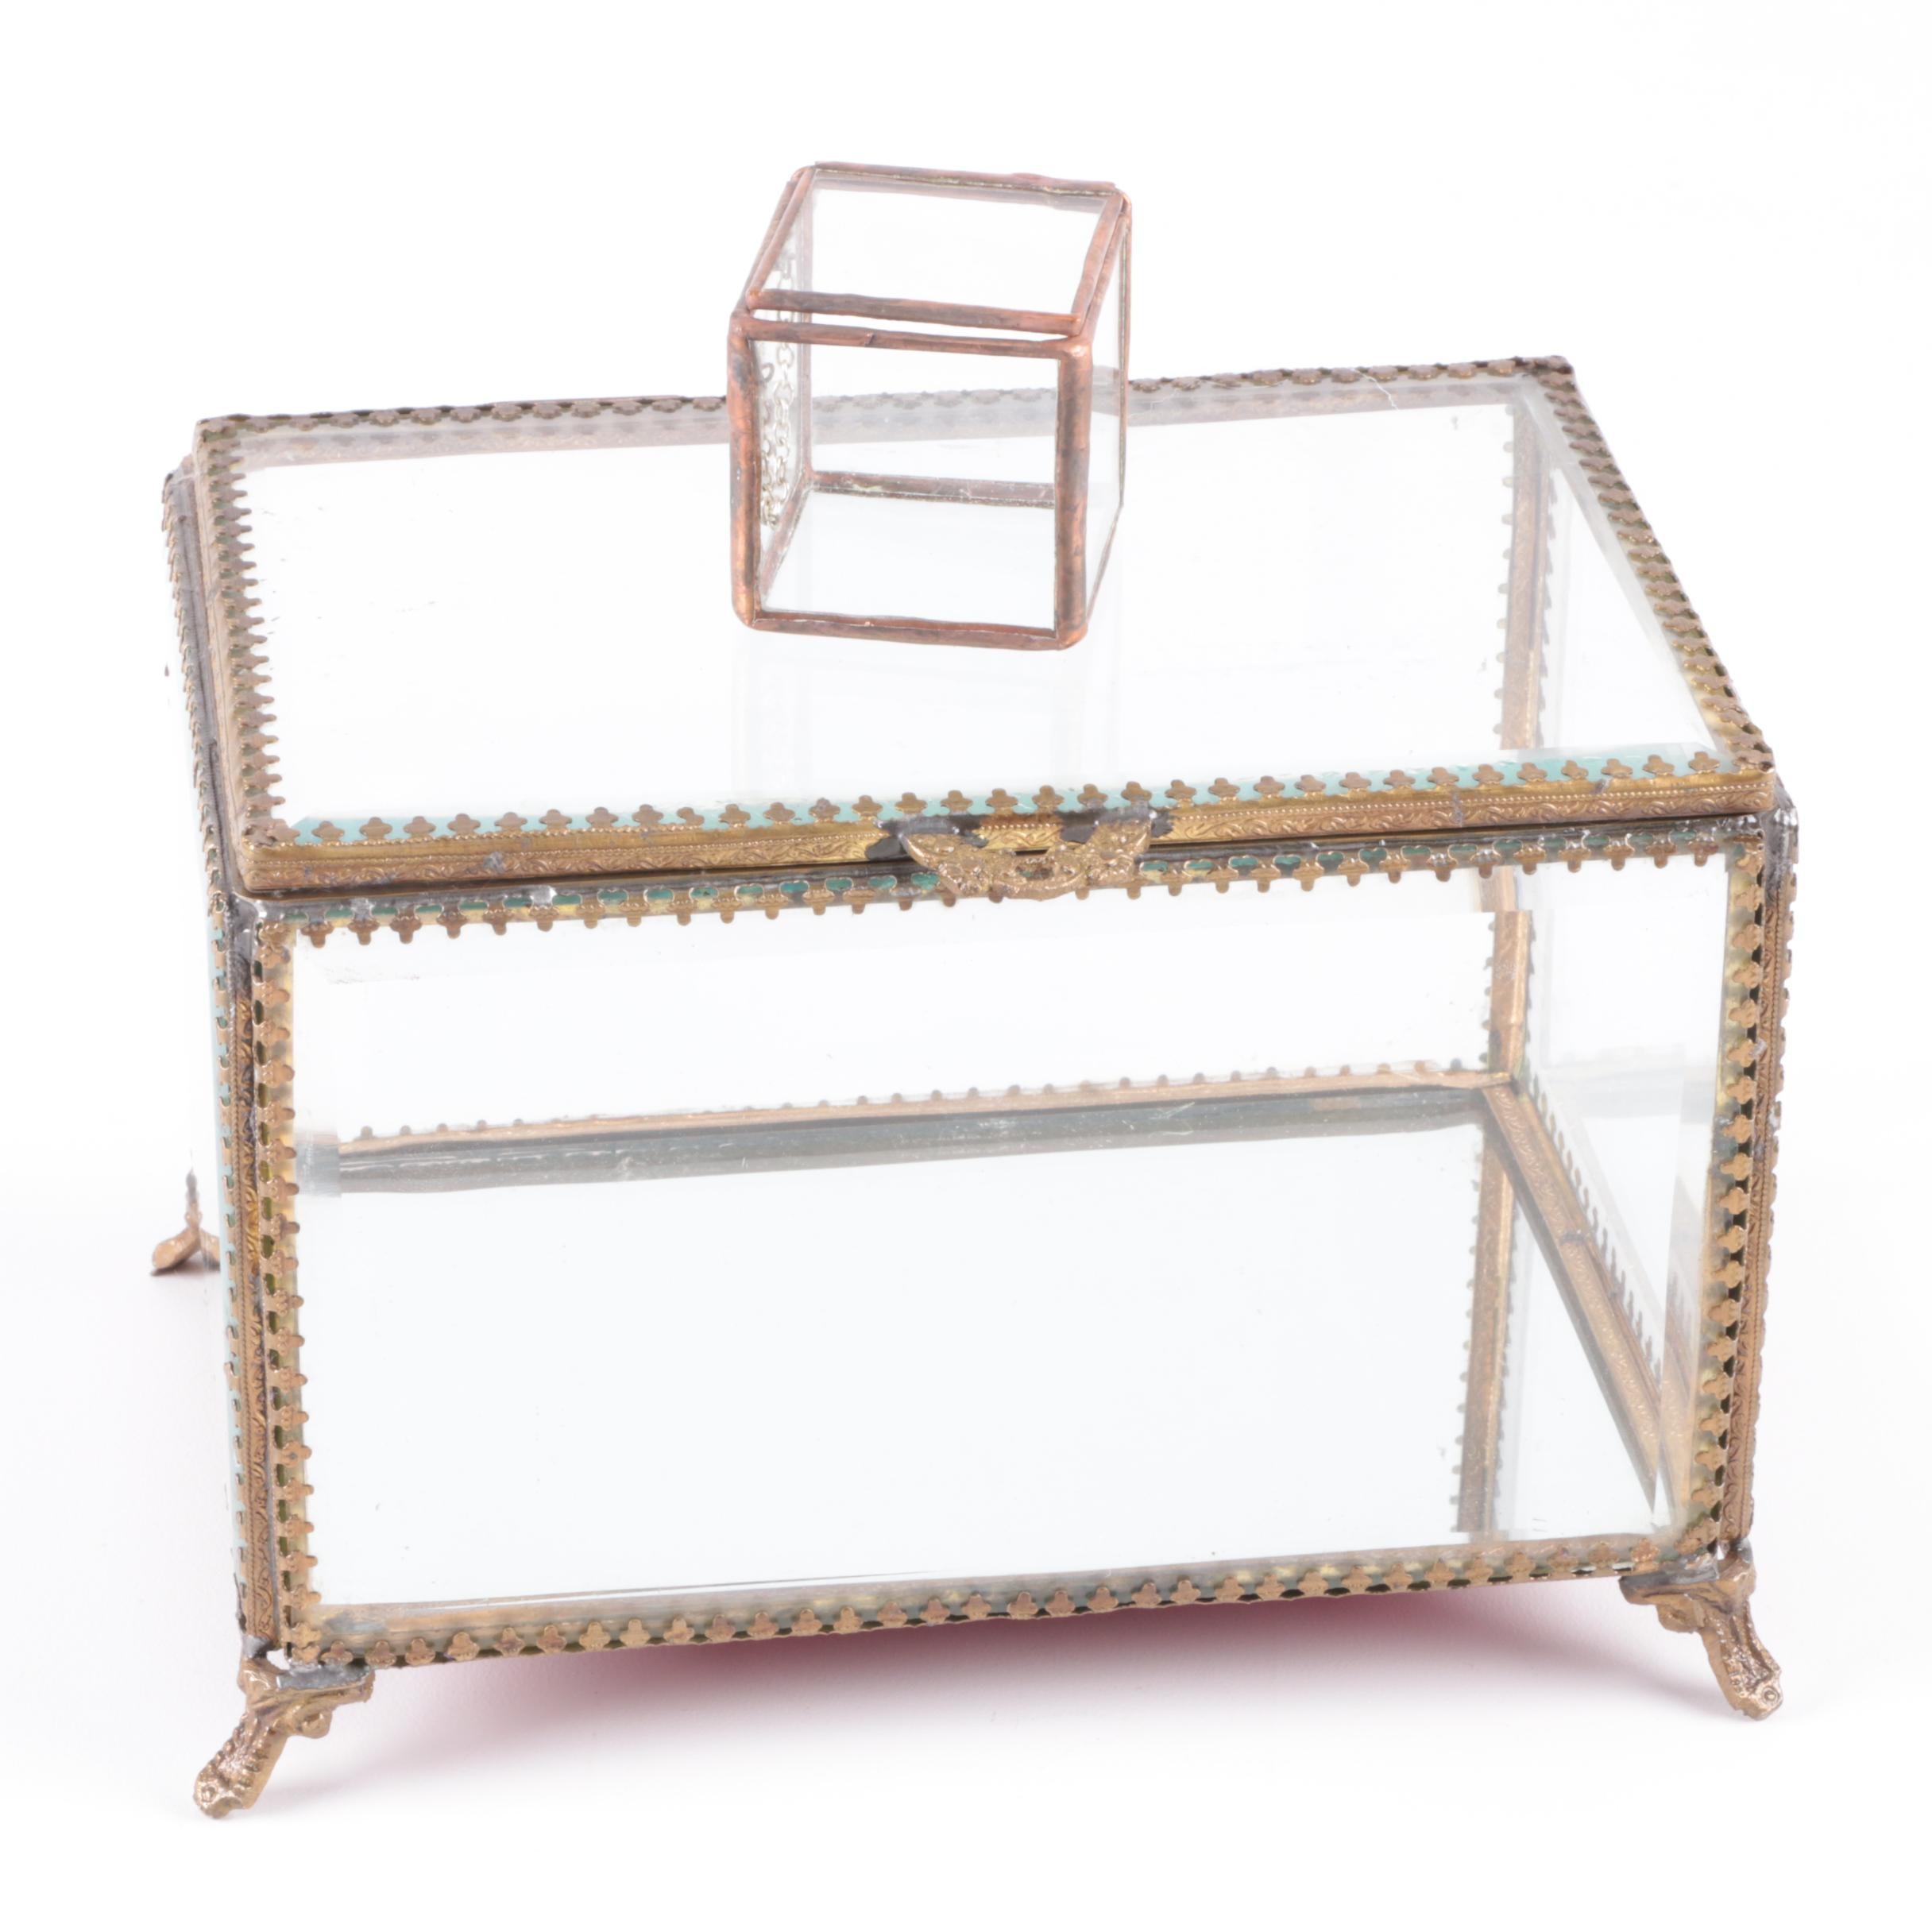 Vintage Glass Trinket Boxes